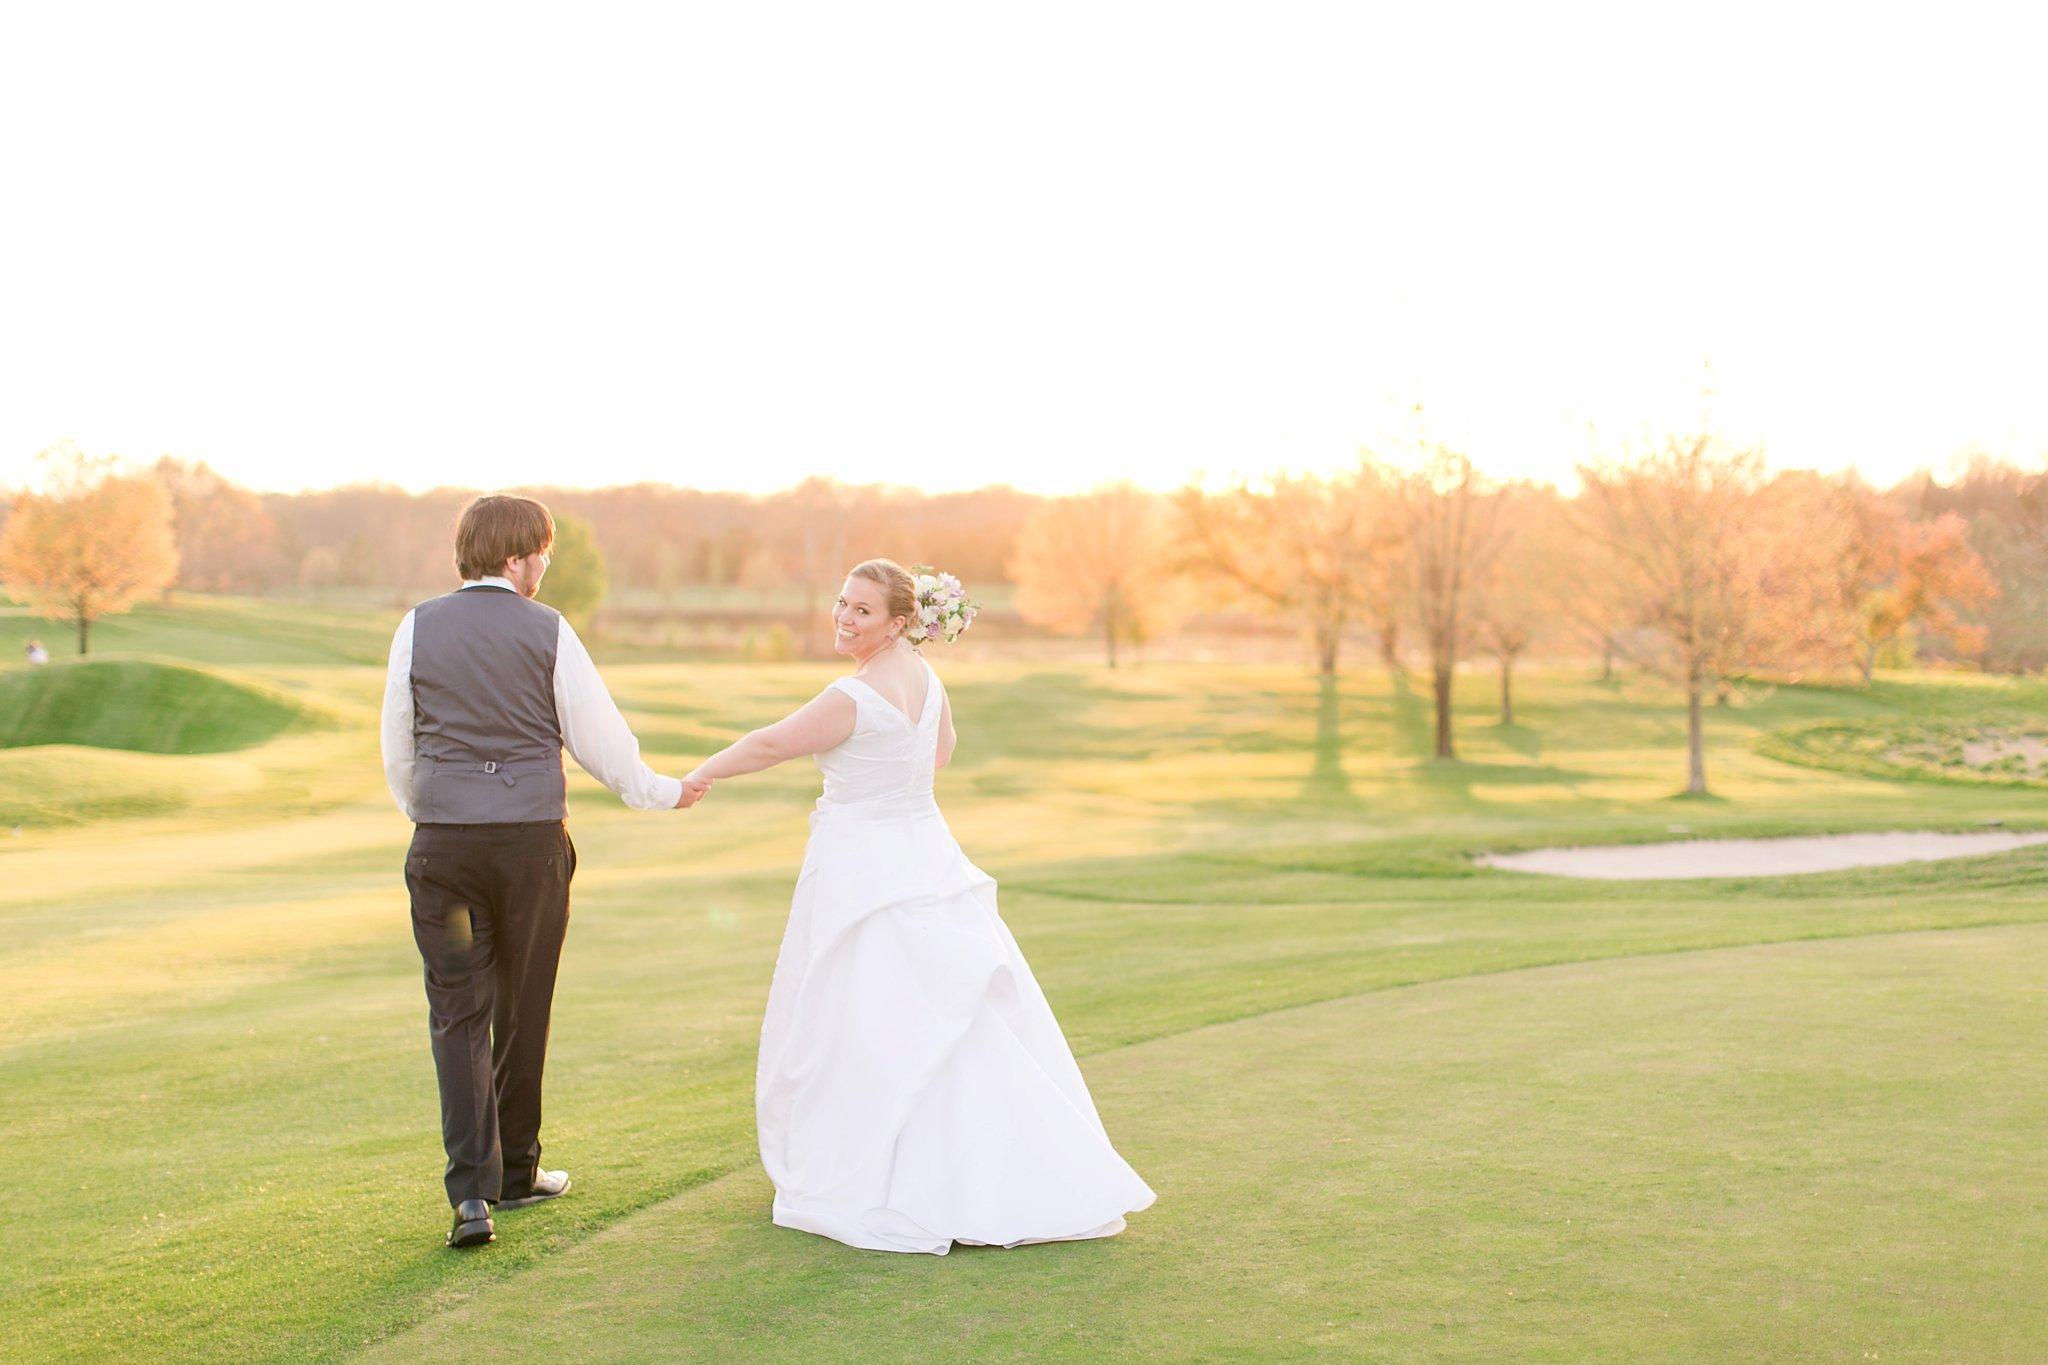 Chantilly National Golf Club Wedding Photos Virginia Wedding Photographer Megan Kelsey Photography Mary Beth and Nathan-113.jpg